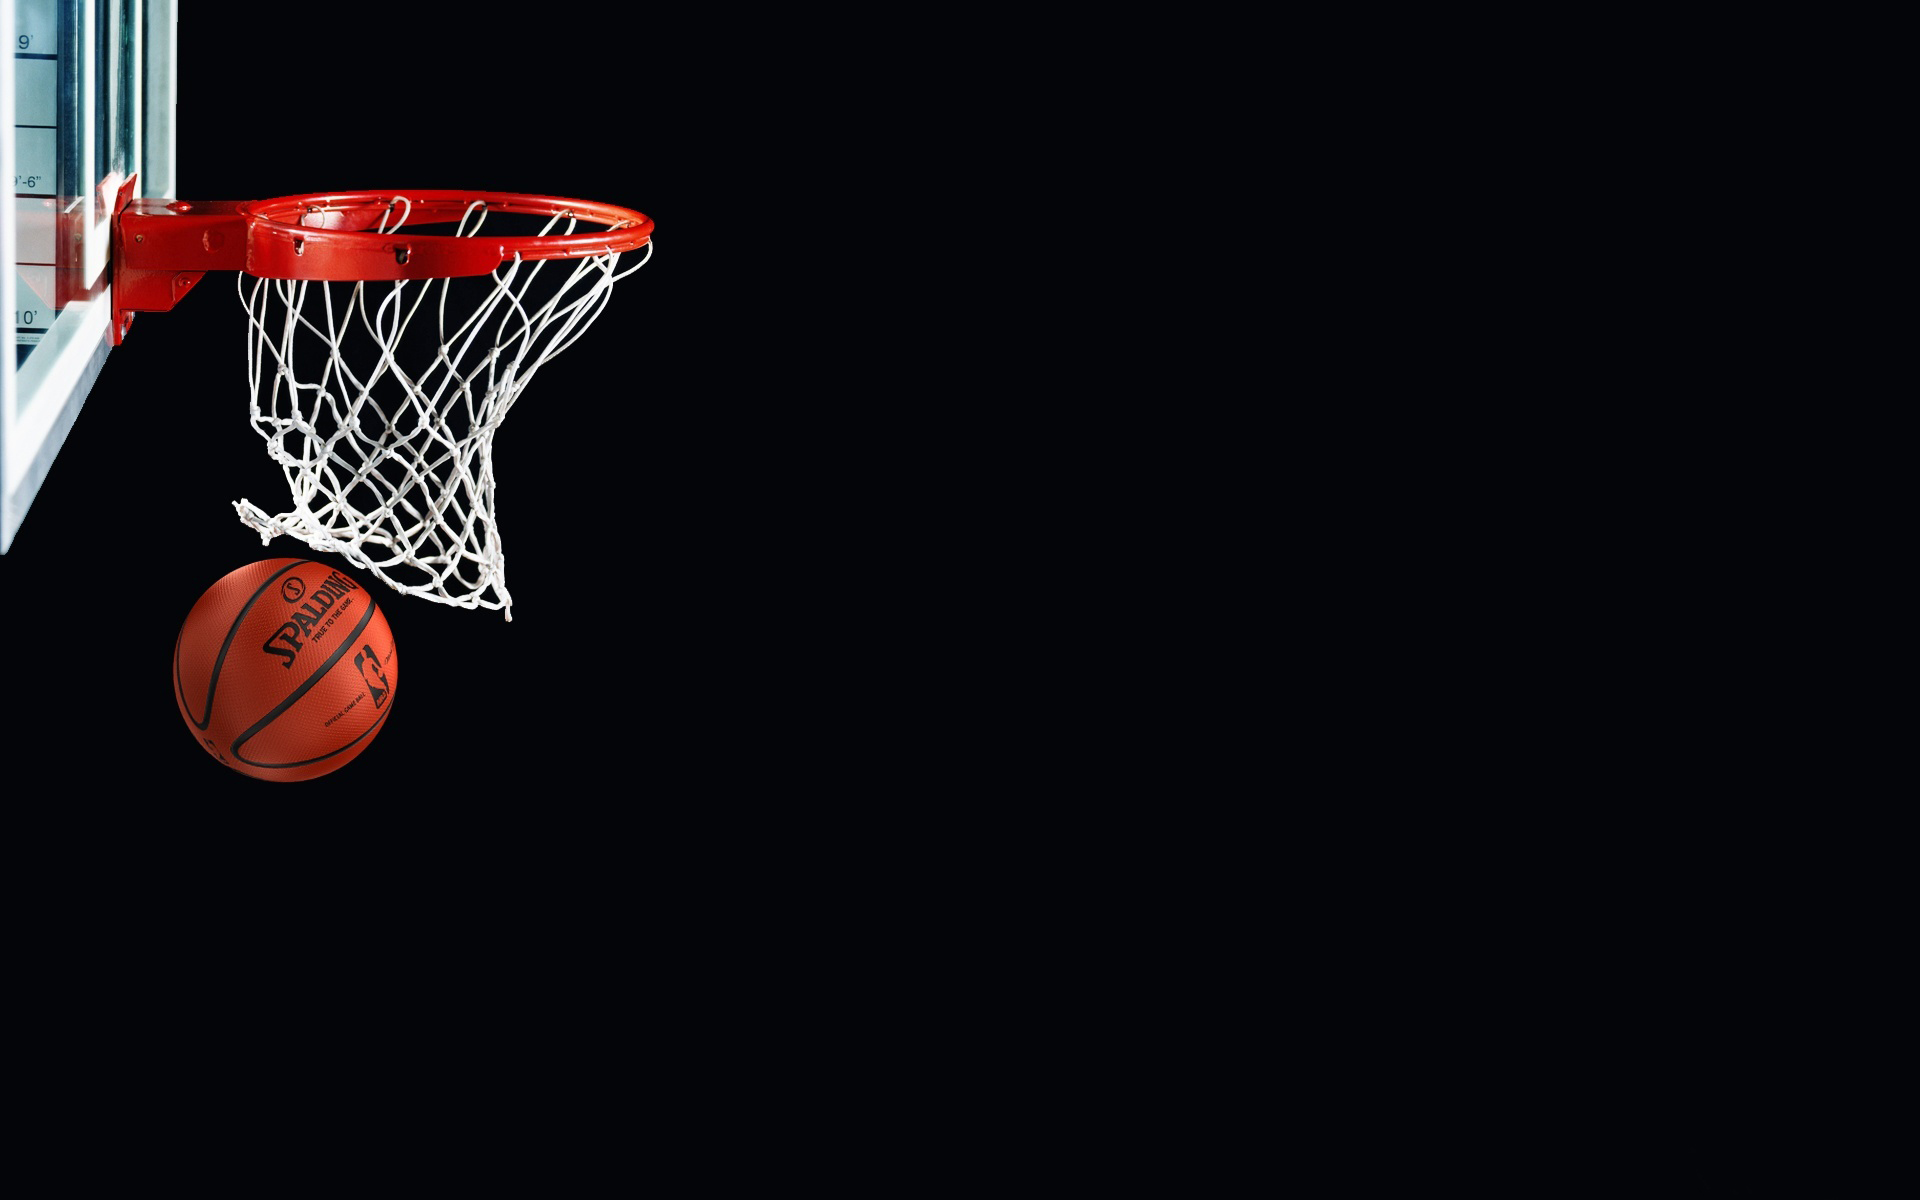 Basketball Computer Wallpapers Desktop Backgrounds 1920x1200 ID 1920x1200